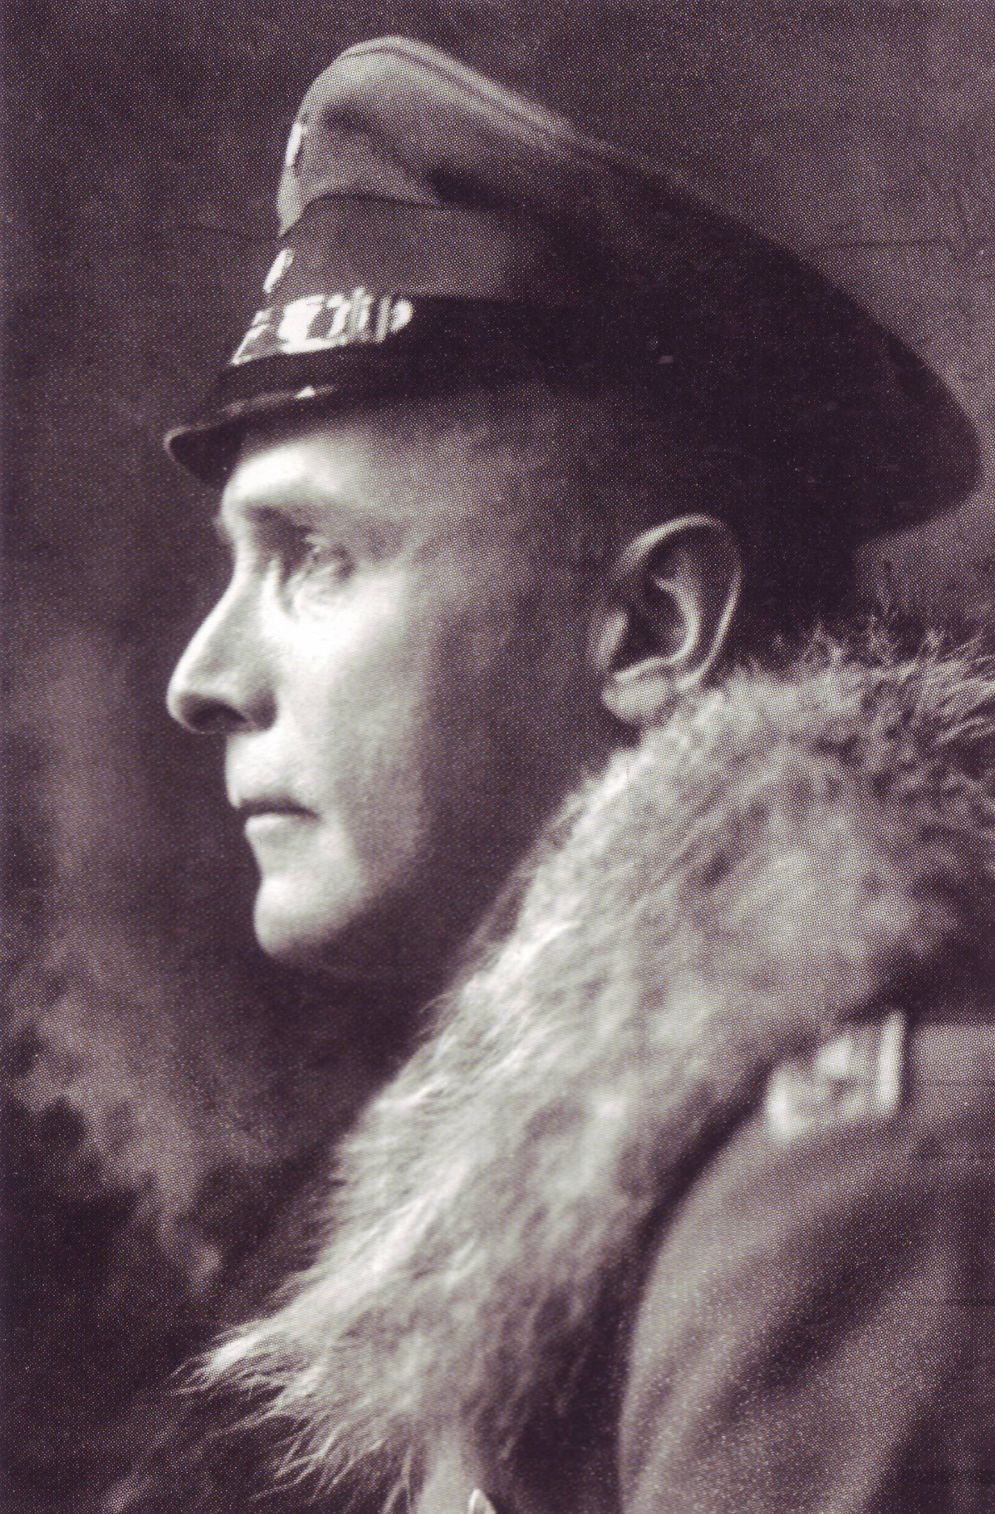 Harry Clemens Ulrich Graf Kessler